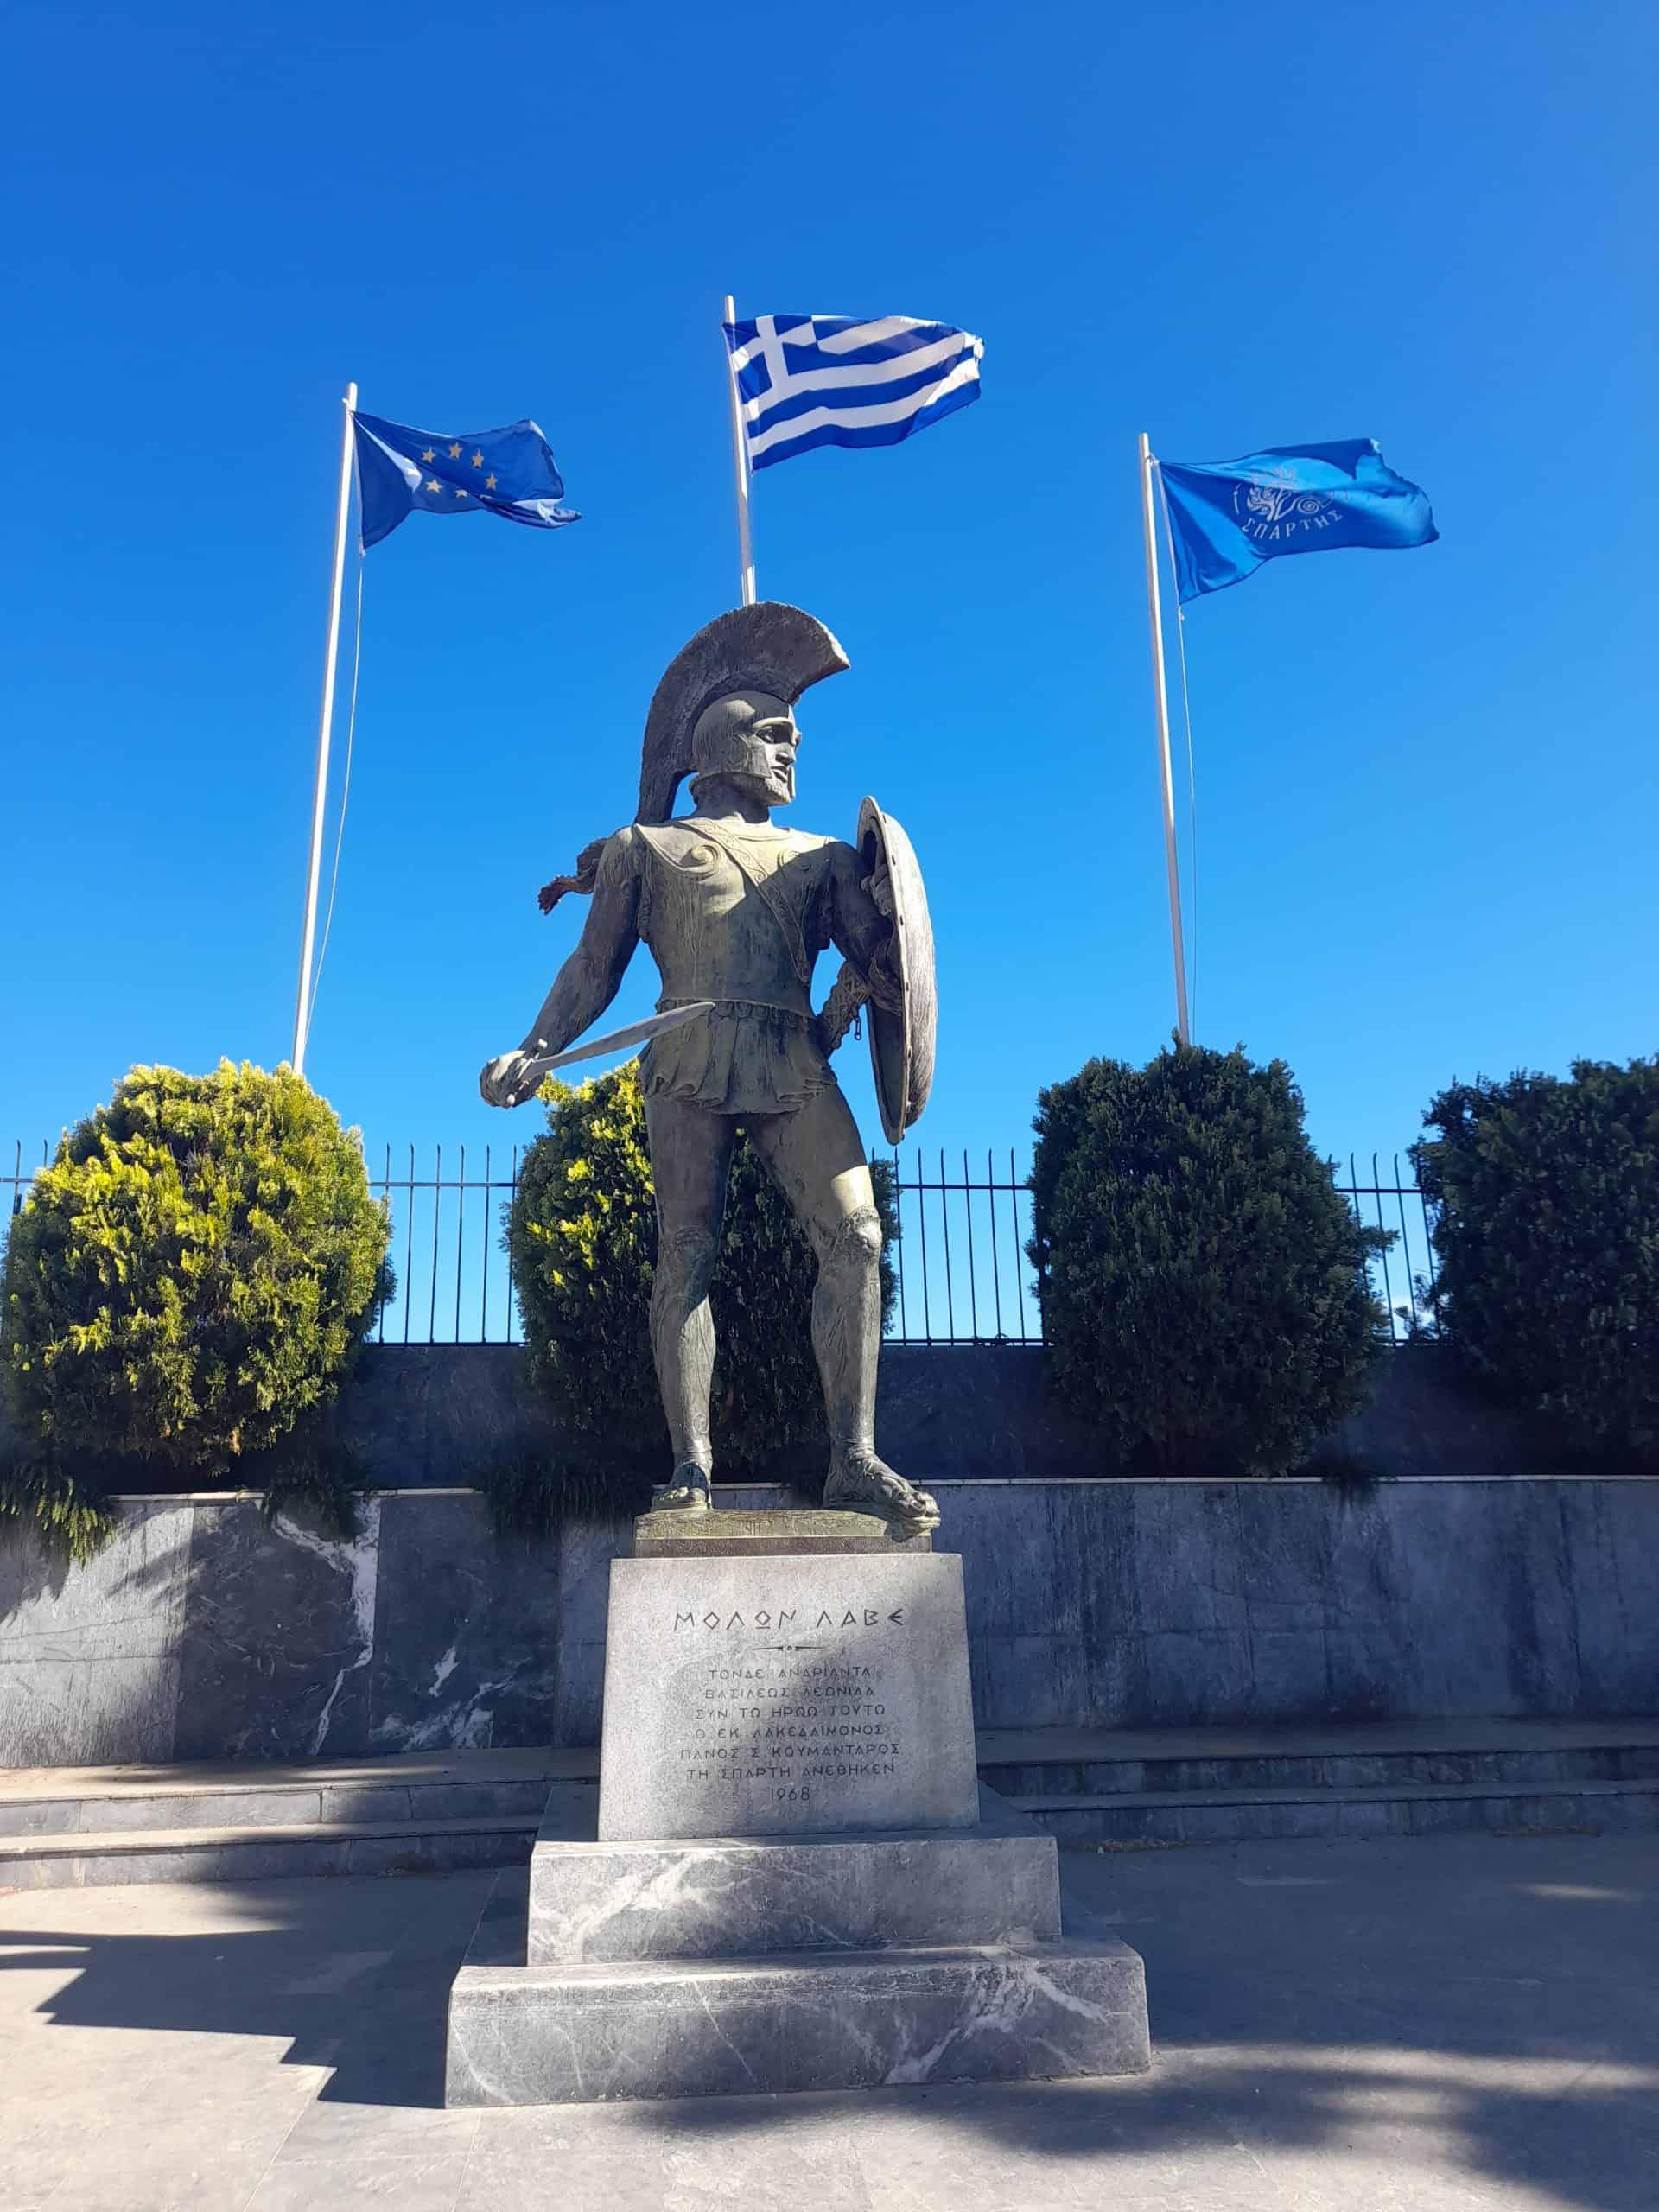 Sparta, the Peloponnese